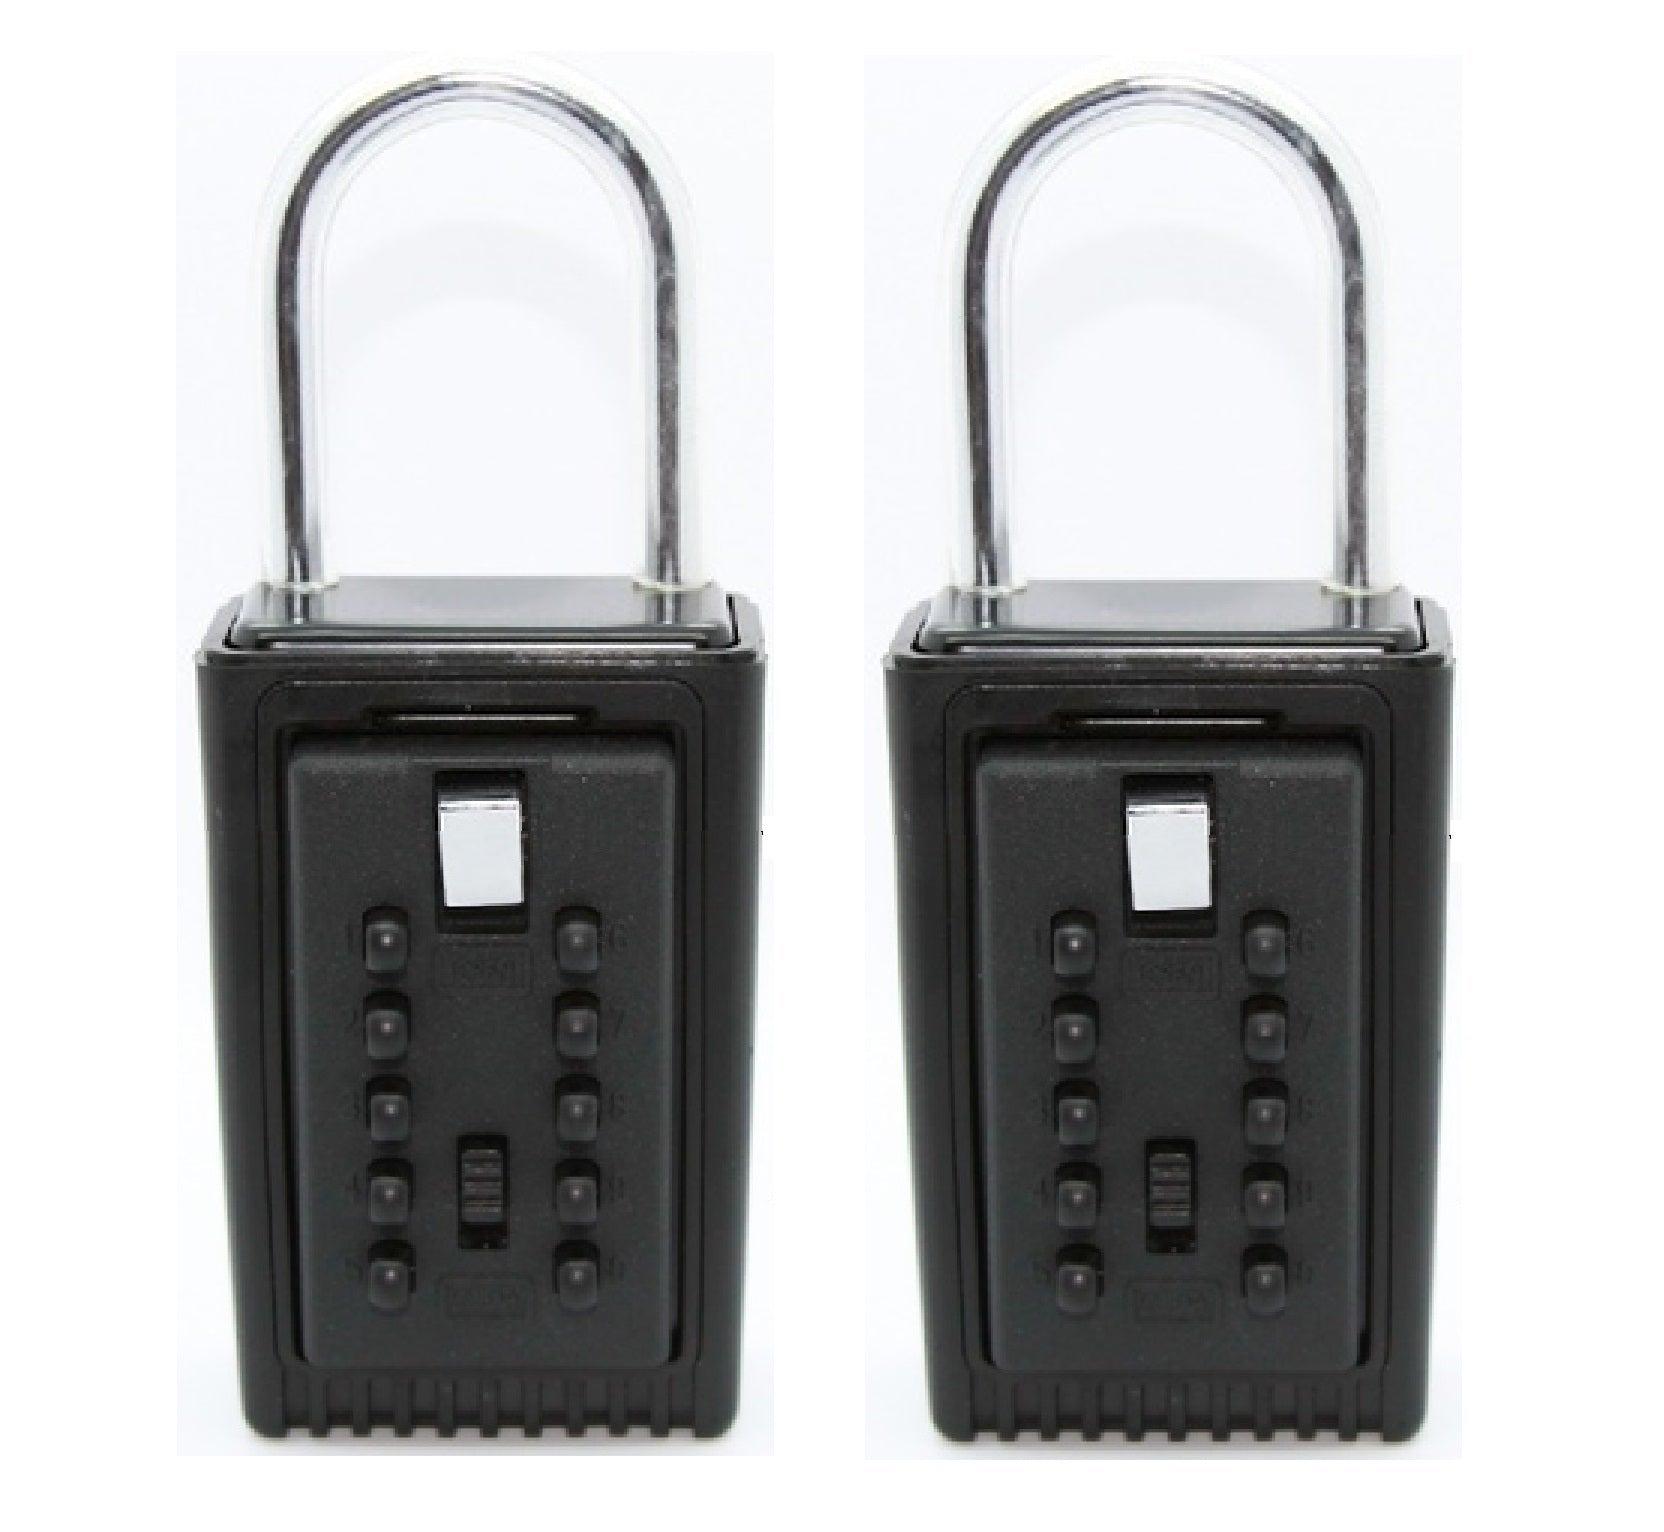 CMI Home Safe HS4C Combination Locking